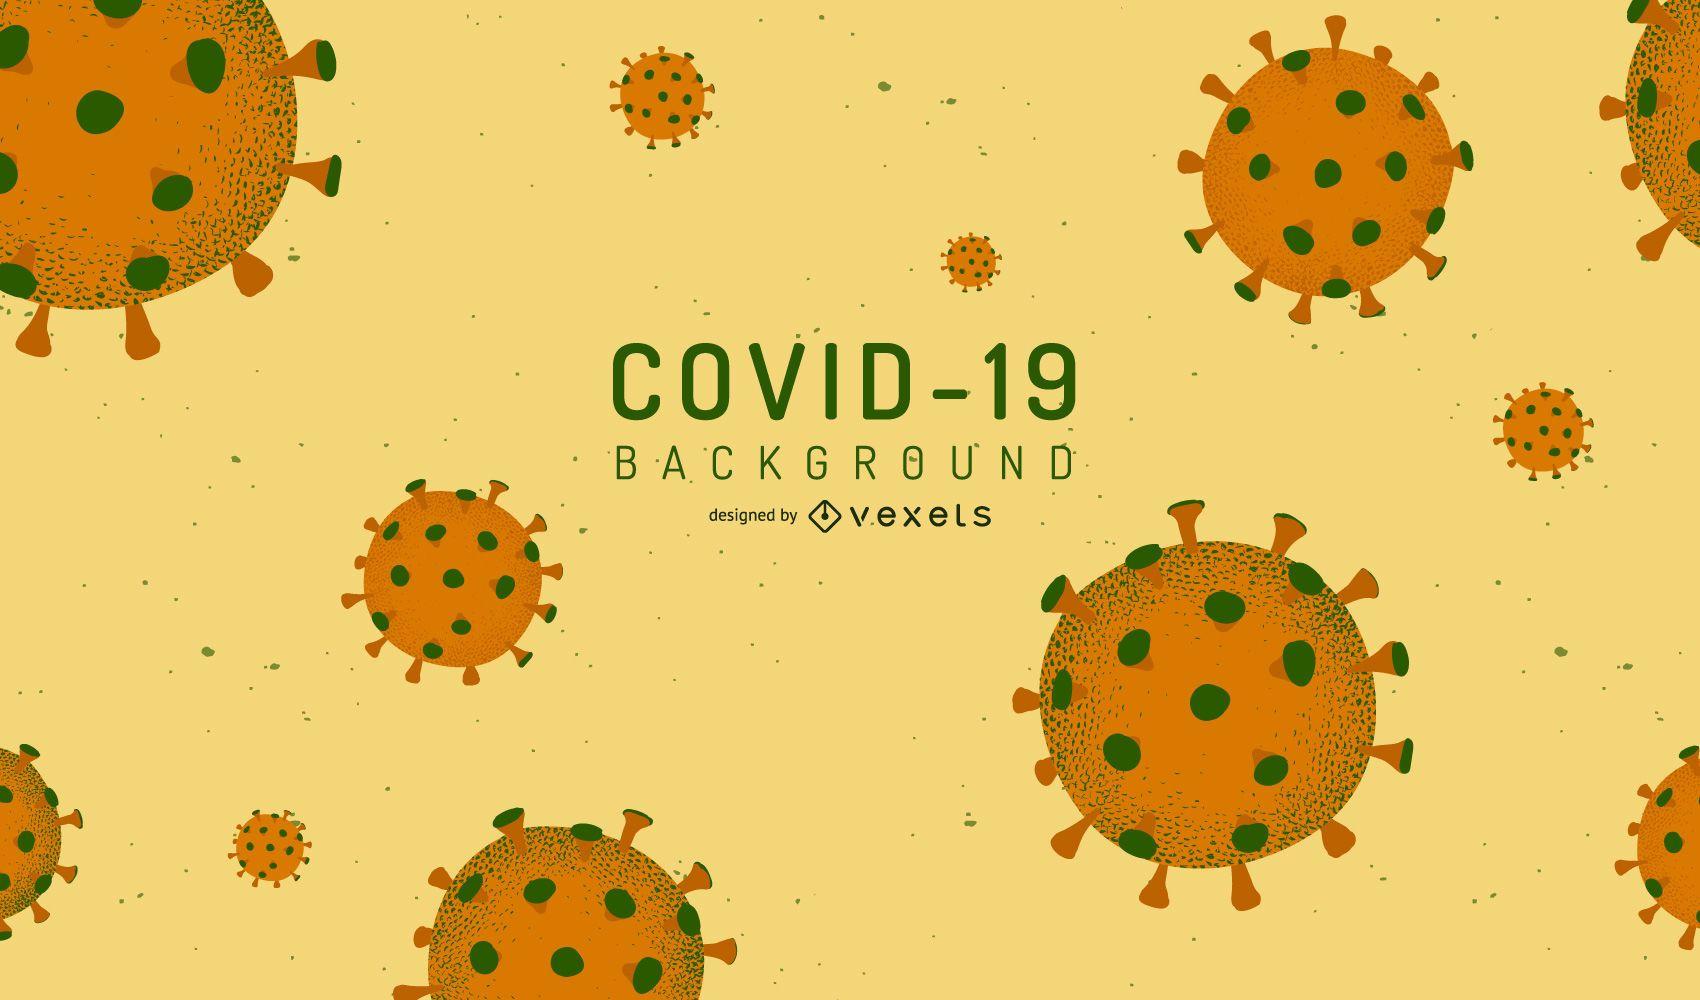 COVID-19 Virus Background Design